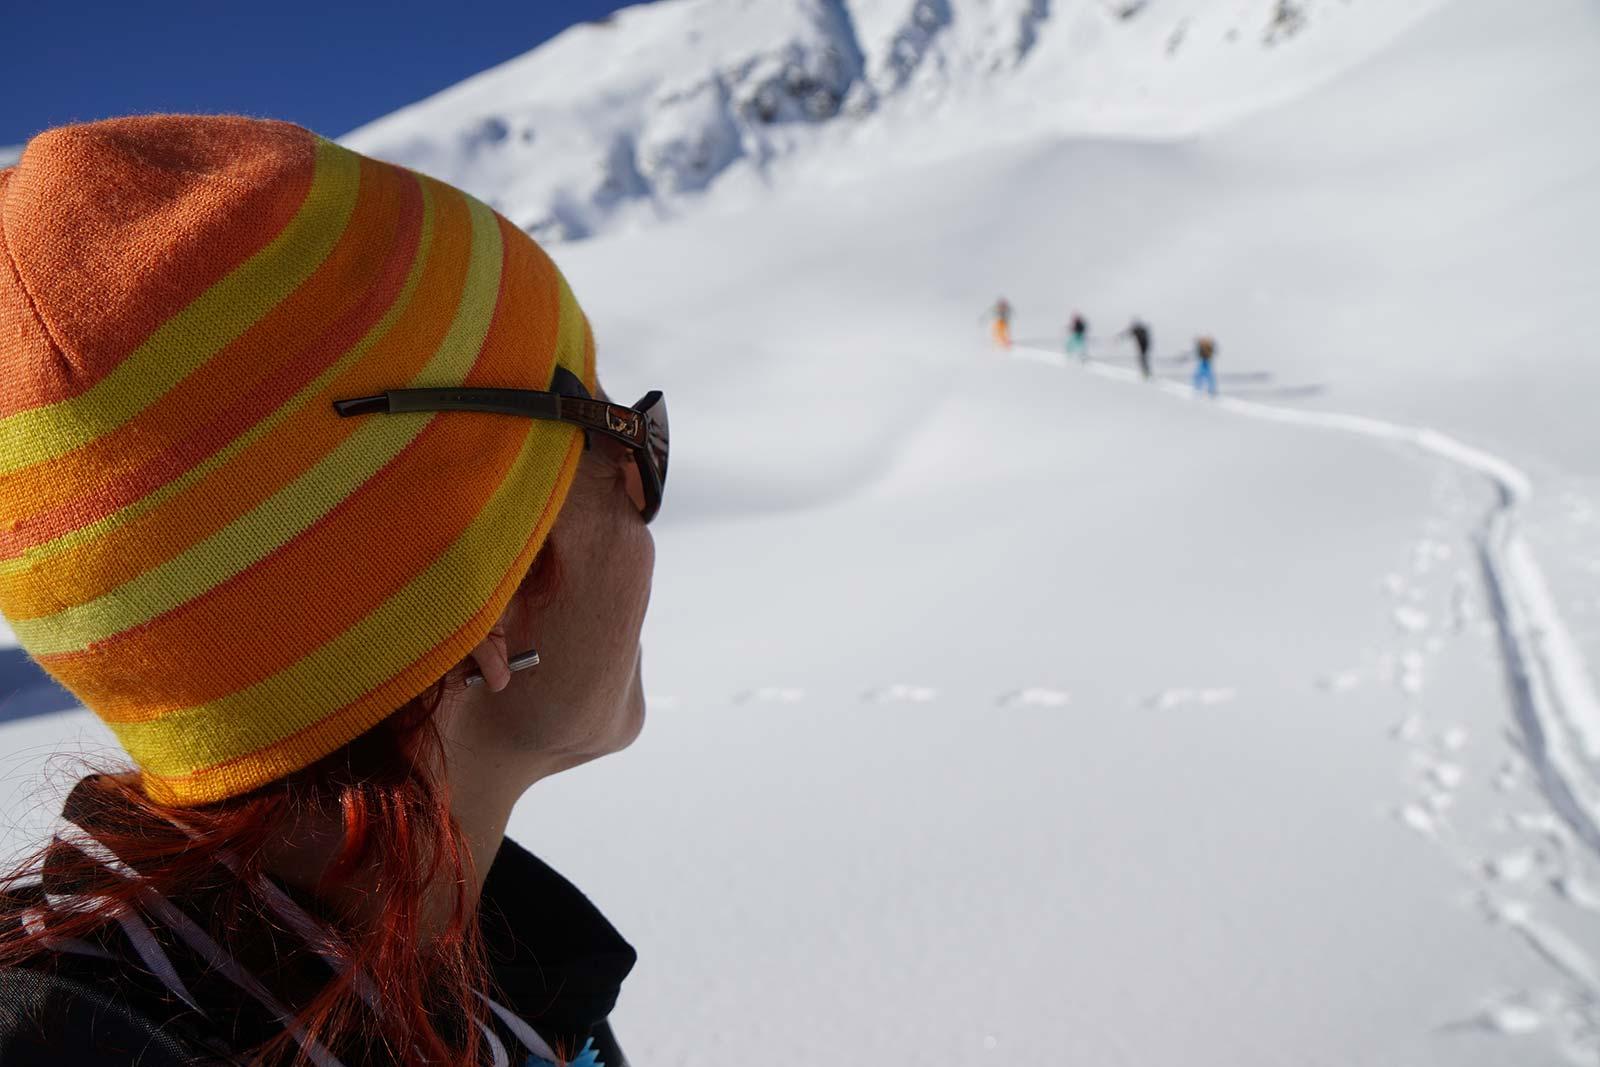 Skitour, lokales Wissen | LO.LA Alpine Safety Management